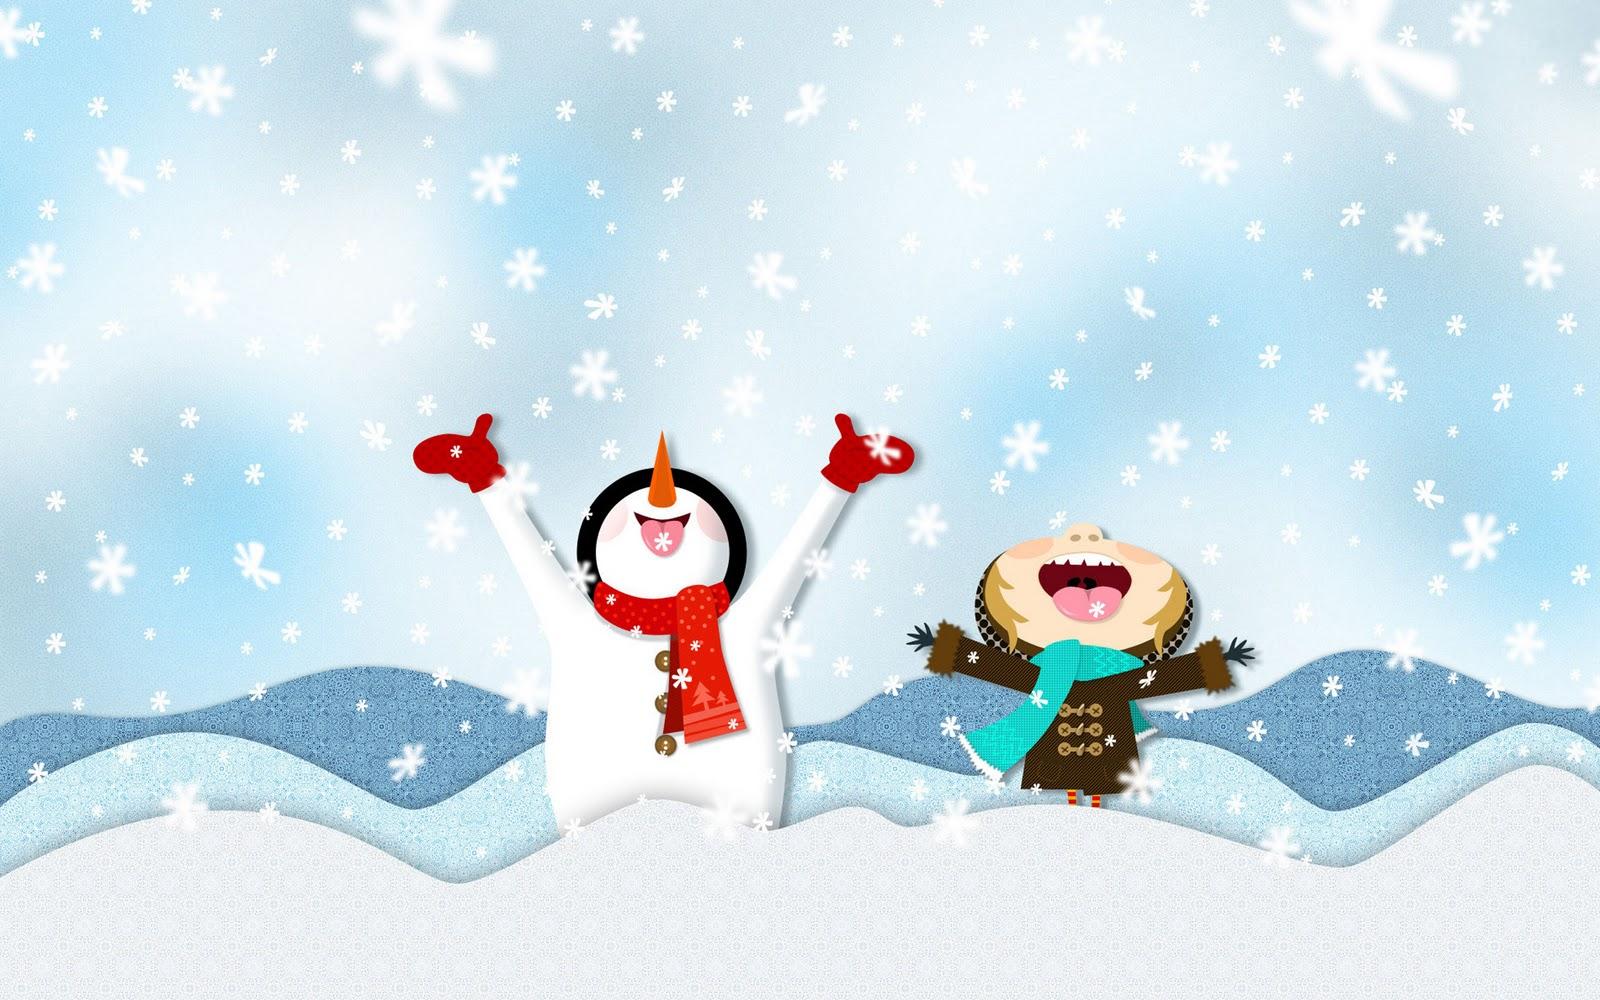 http://3.bp.blogspot.com/-DoX8CMBMSp8/TvcwjfymRnI/AAAAAAAAHXI/MU118IDV14o/s1600/free+animated+christmas+desktop+wallpaper+for+kids.jpeg